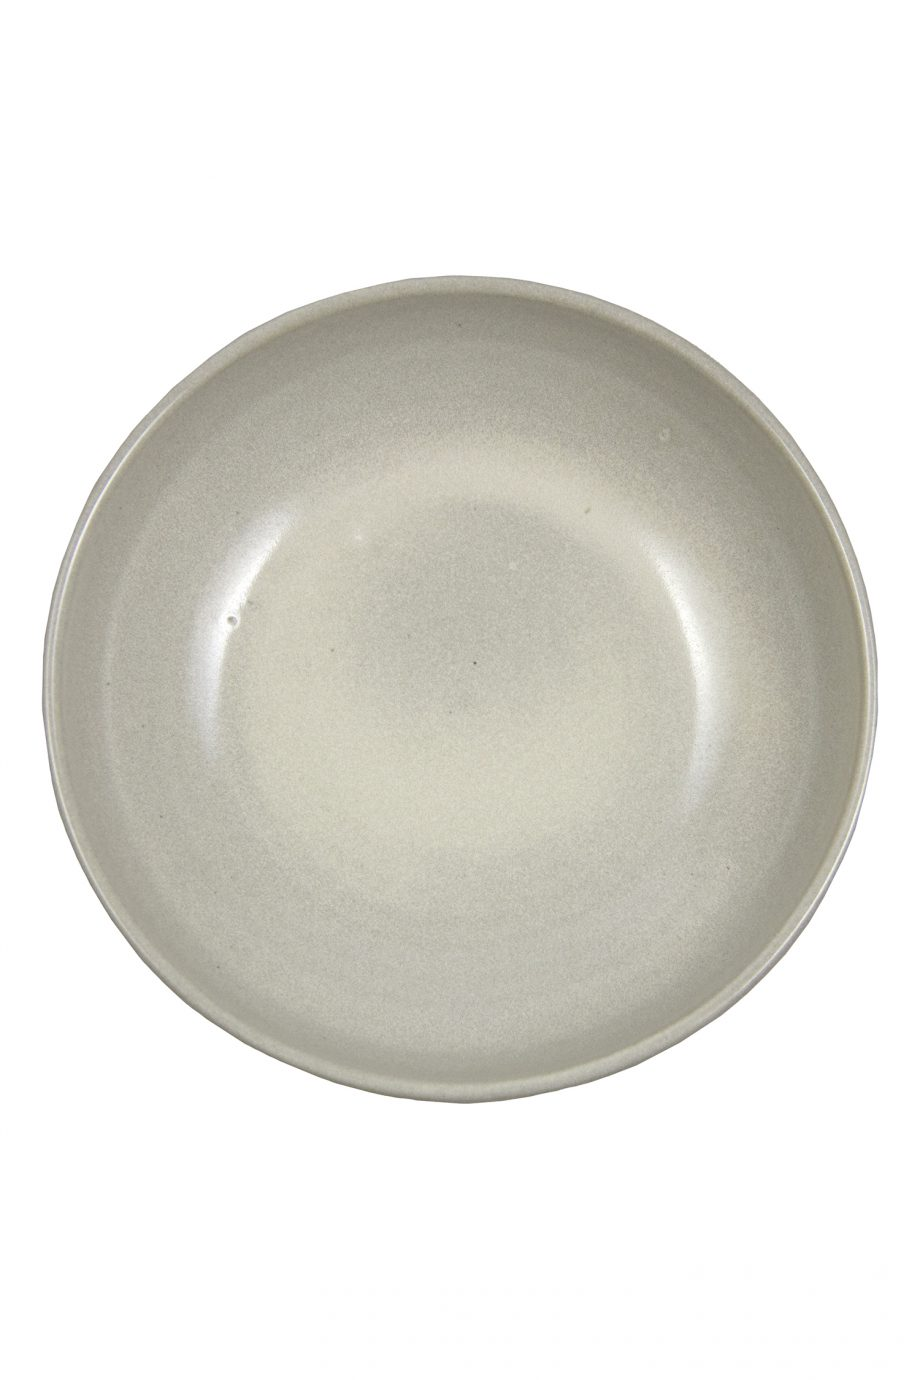 soep bord melk wit glaze ceramic medium